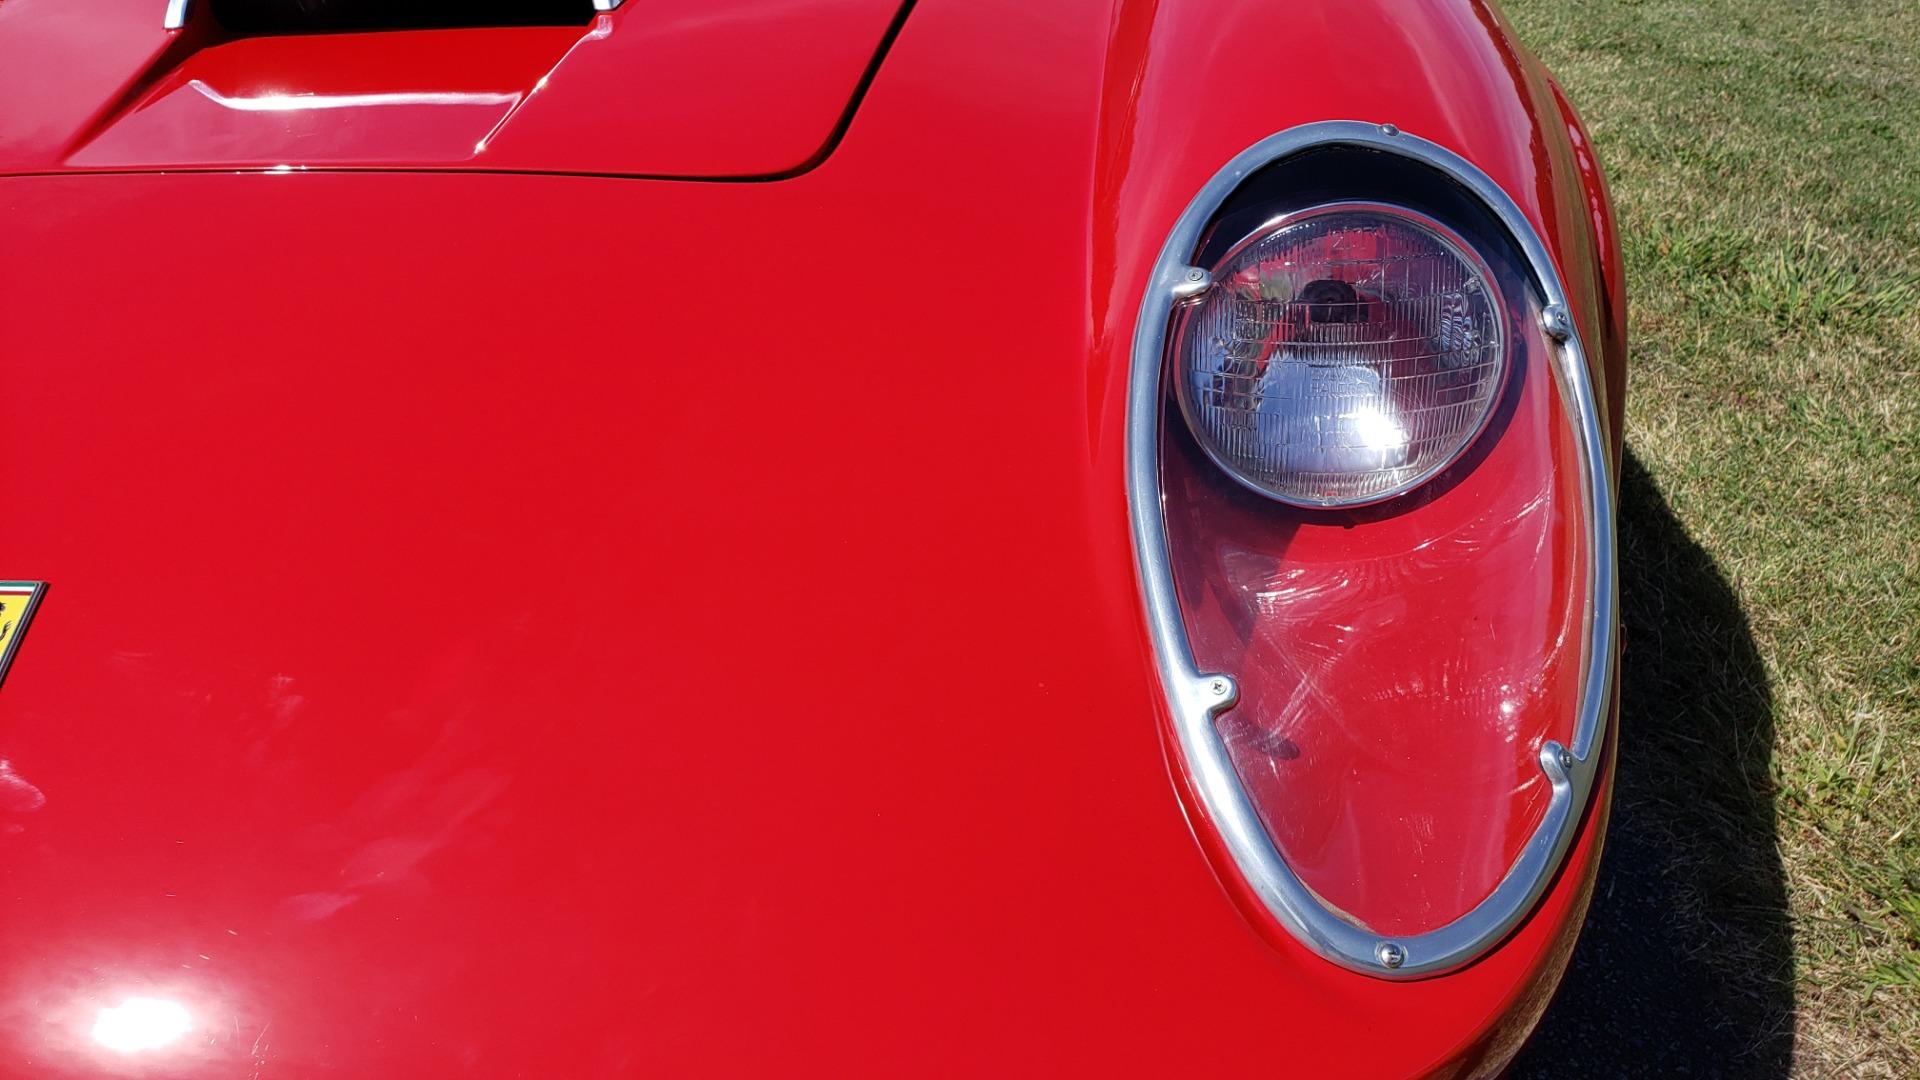 Used 1961 Ferrari 250GT SWB CALIFORNIA REPLICA / 302CI V8 / TREMEC 5-SPEED for sale Sold at Formula Imports in Charlotte NC 28227 28